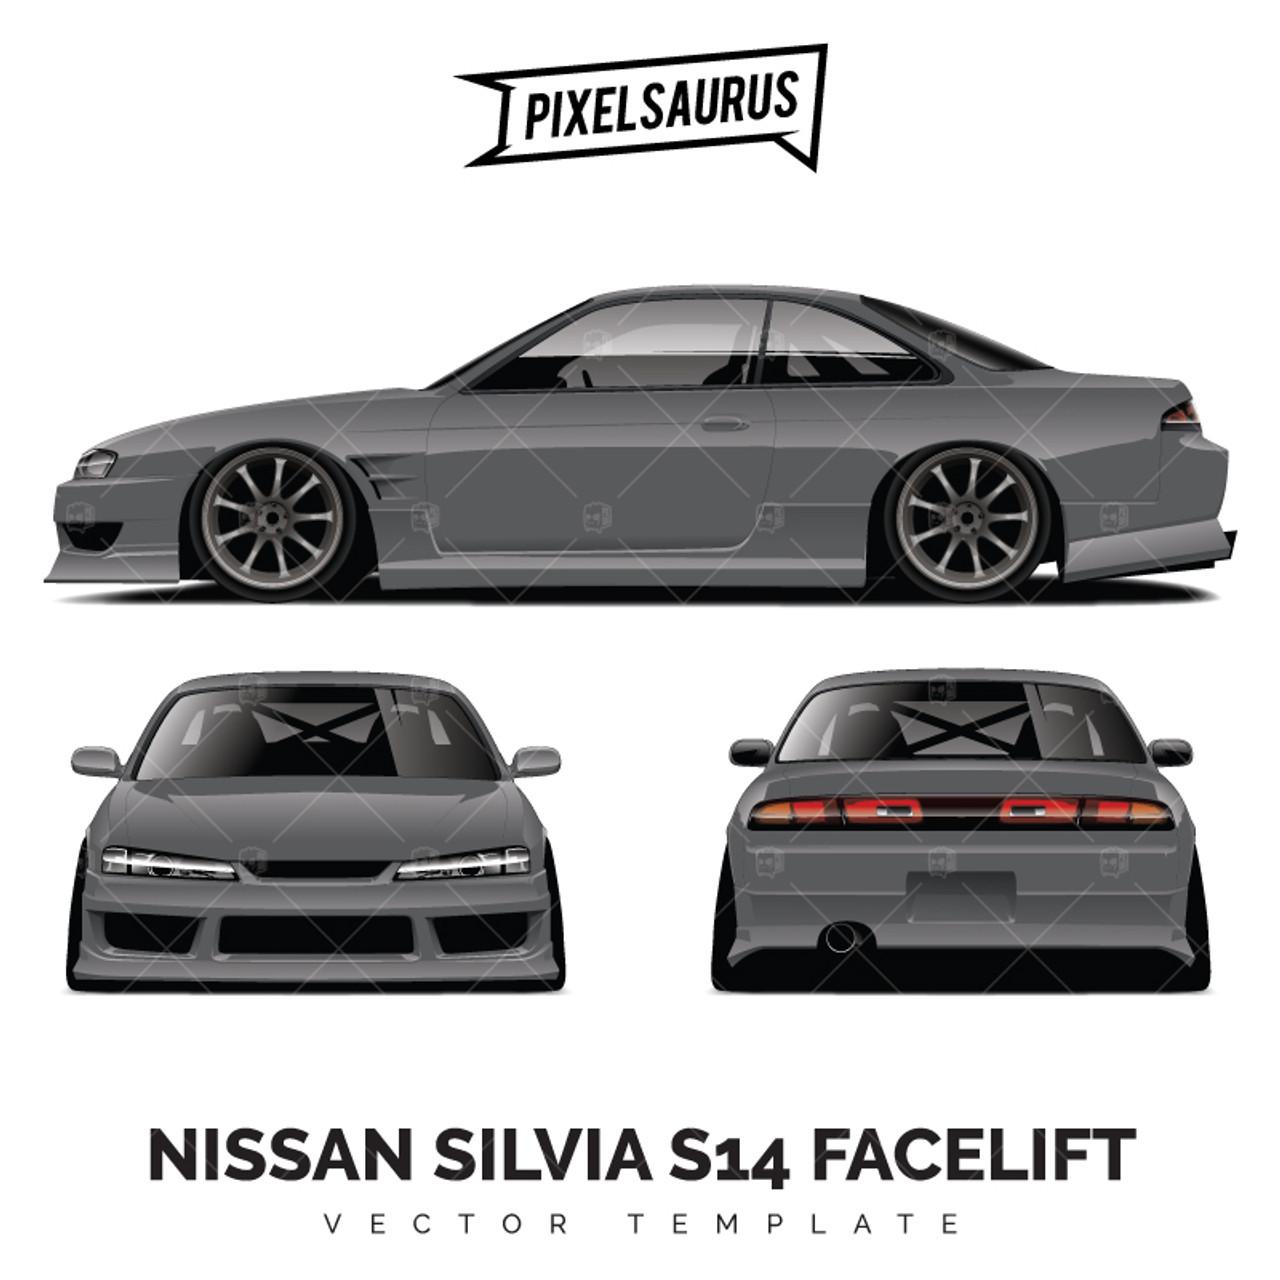 nissan silvia s14 facelift drift car vector template - pixelsaurus  pixelsaurus